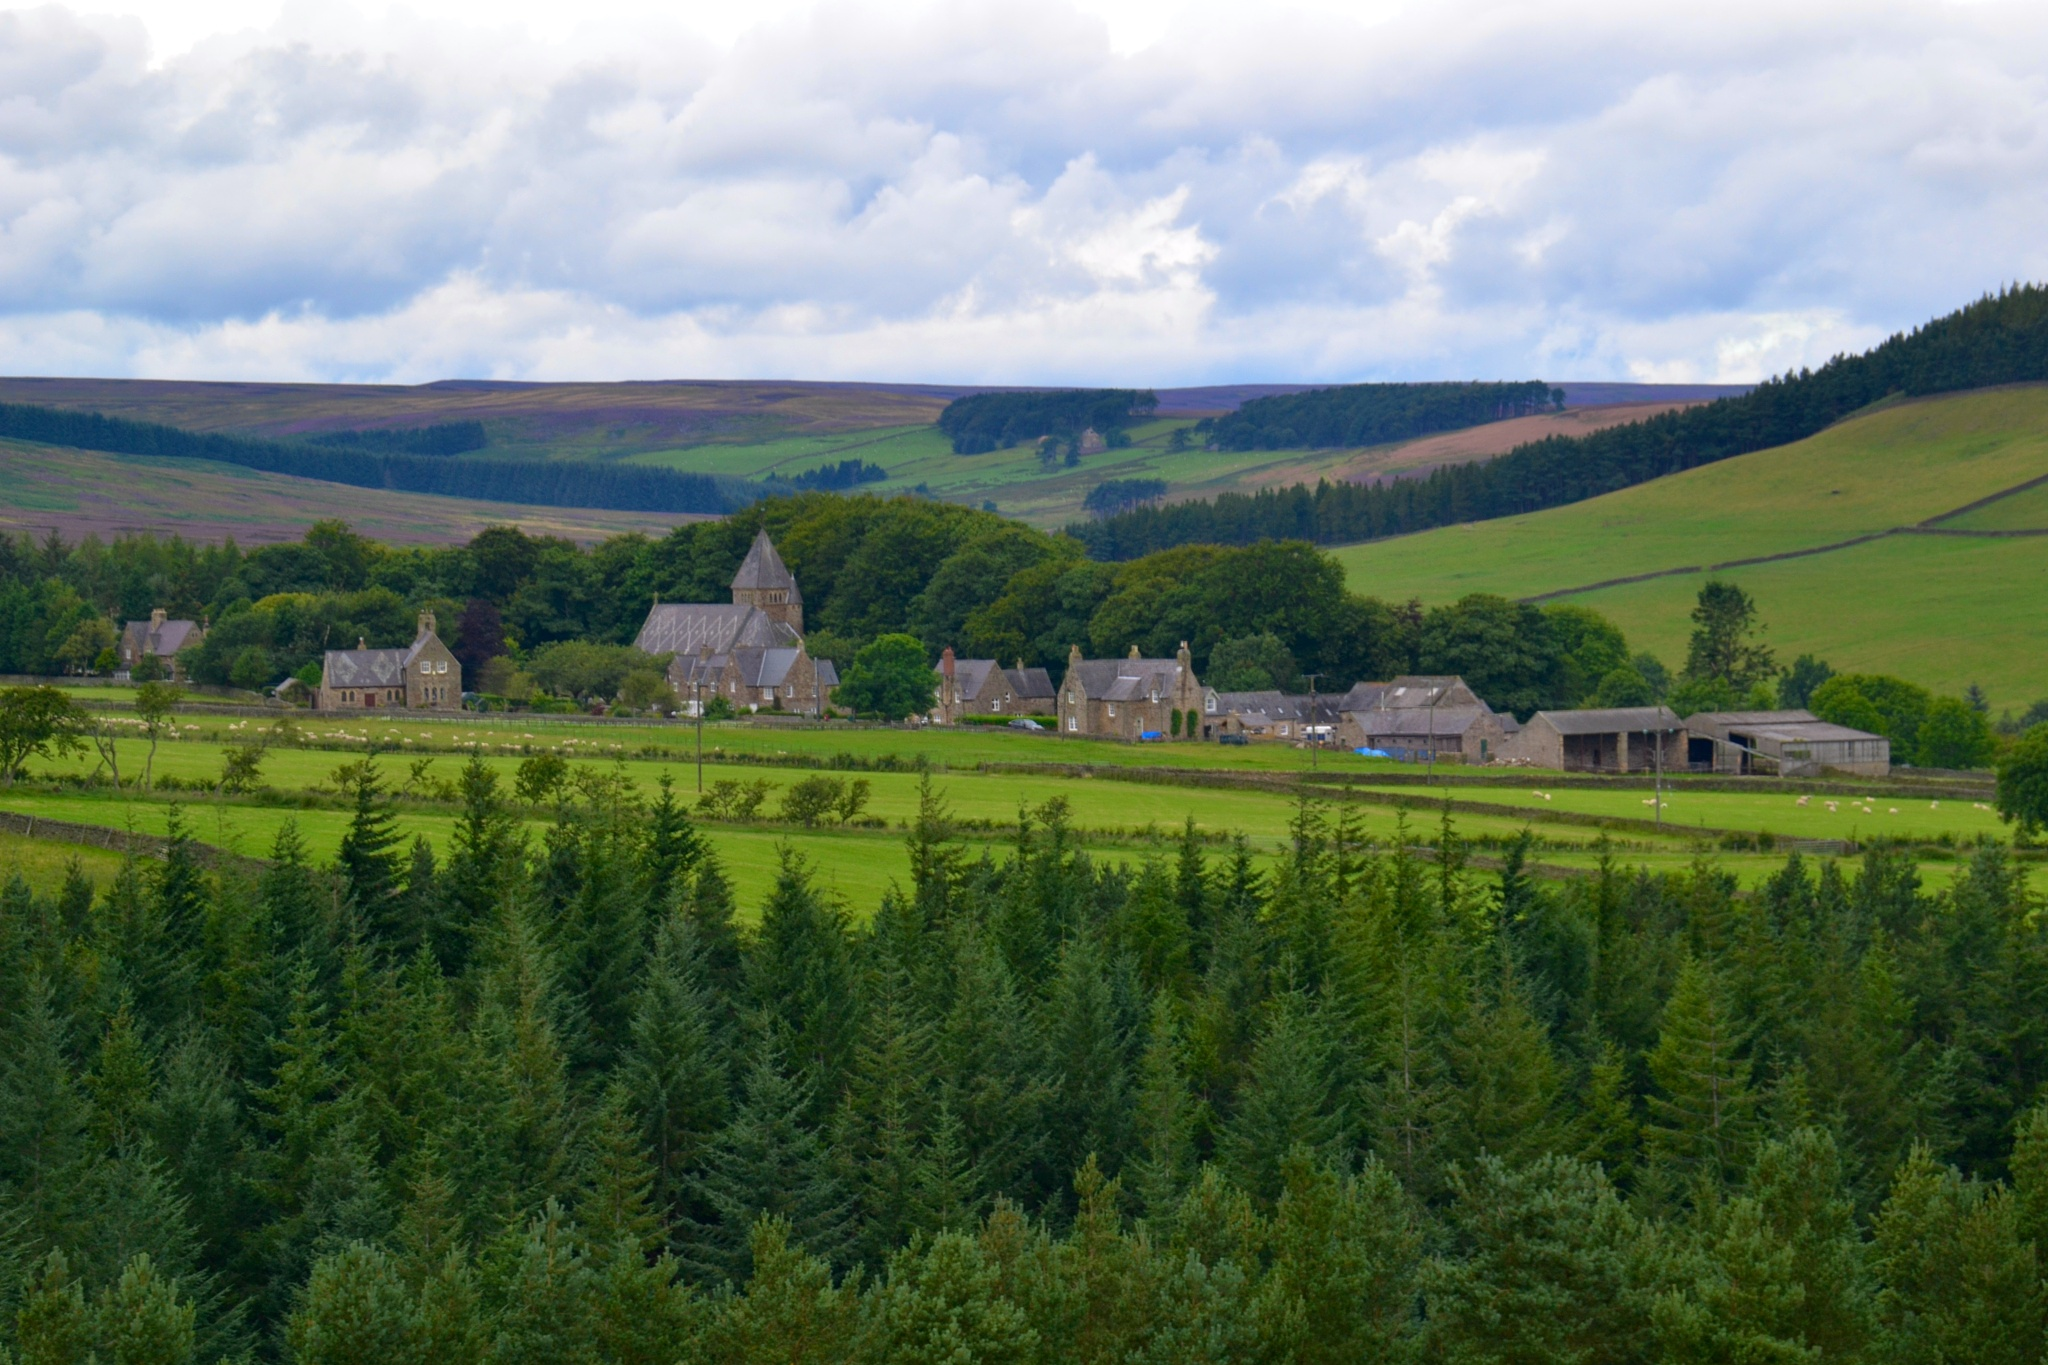 Village scene by AlanWilliams